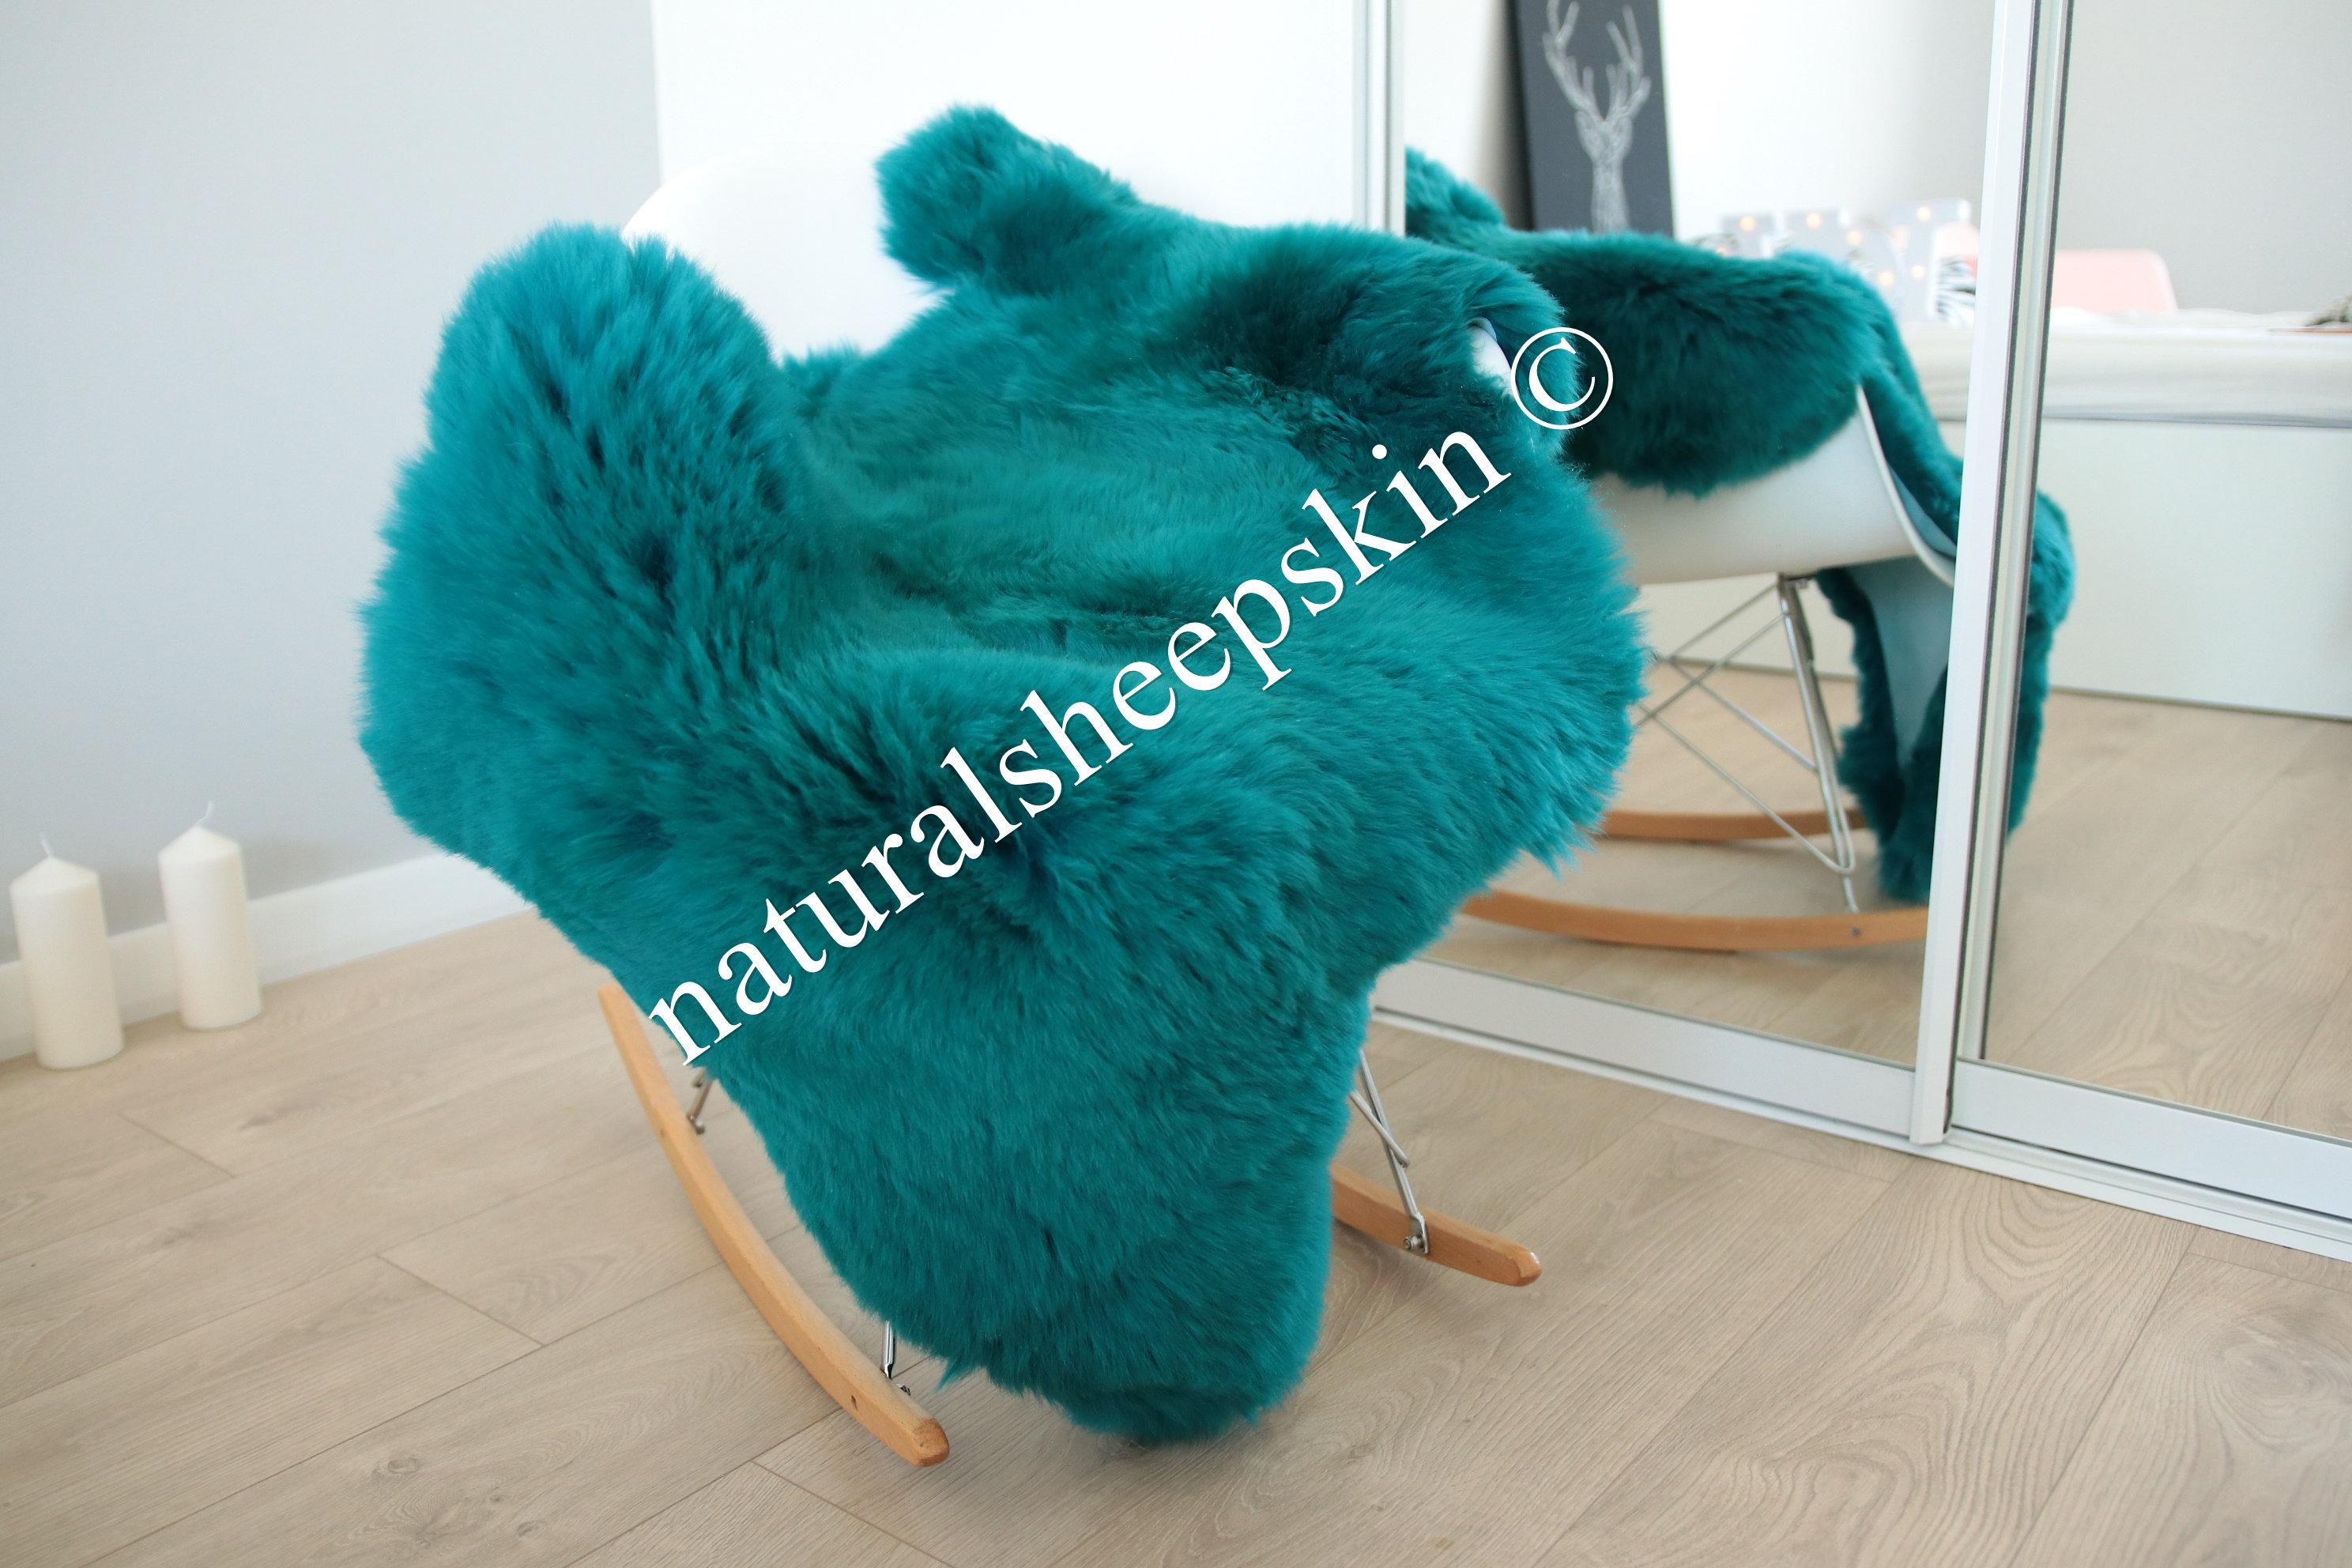 Genuine Natural Emerald Green Sheepskin Rug Sheepskin Throw Scandinavian Style Scandinavian Rug Emerald Green Sheepskin